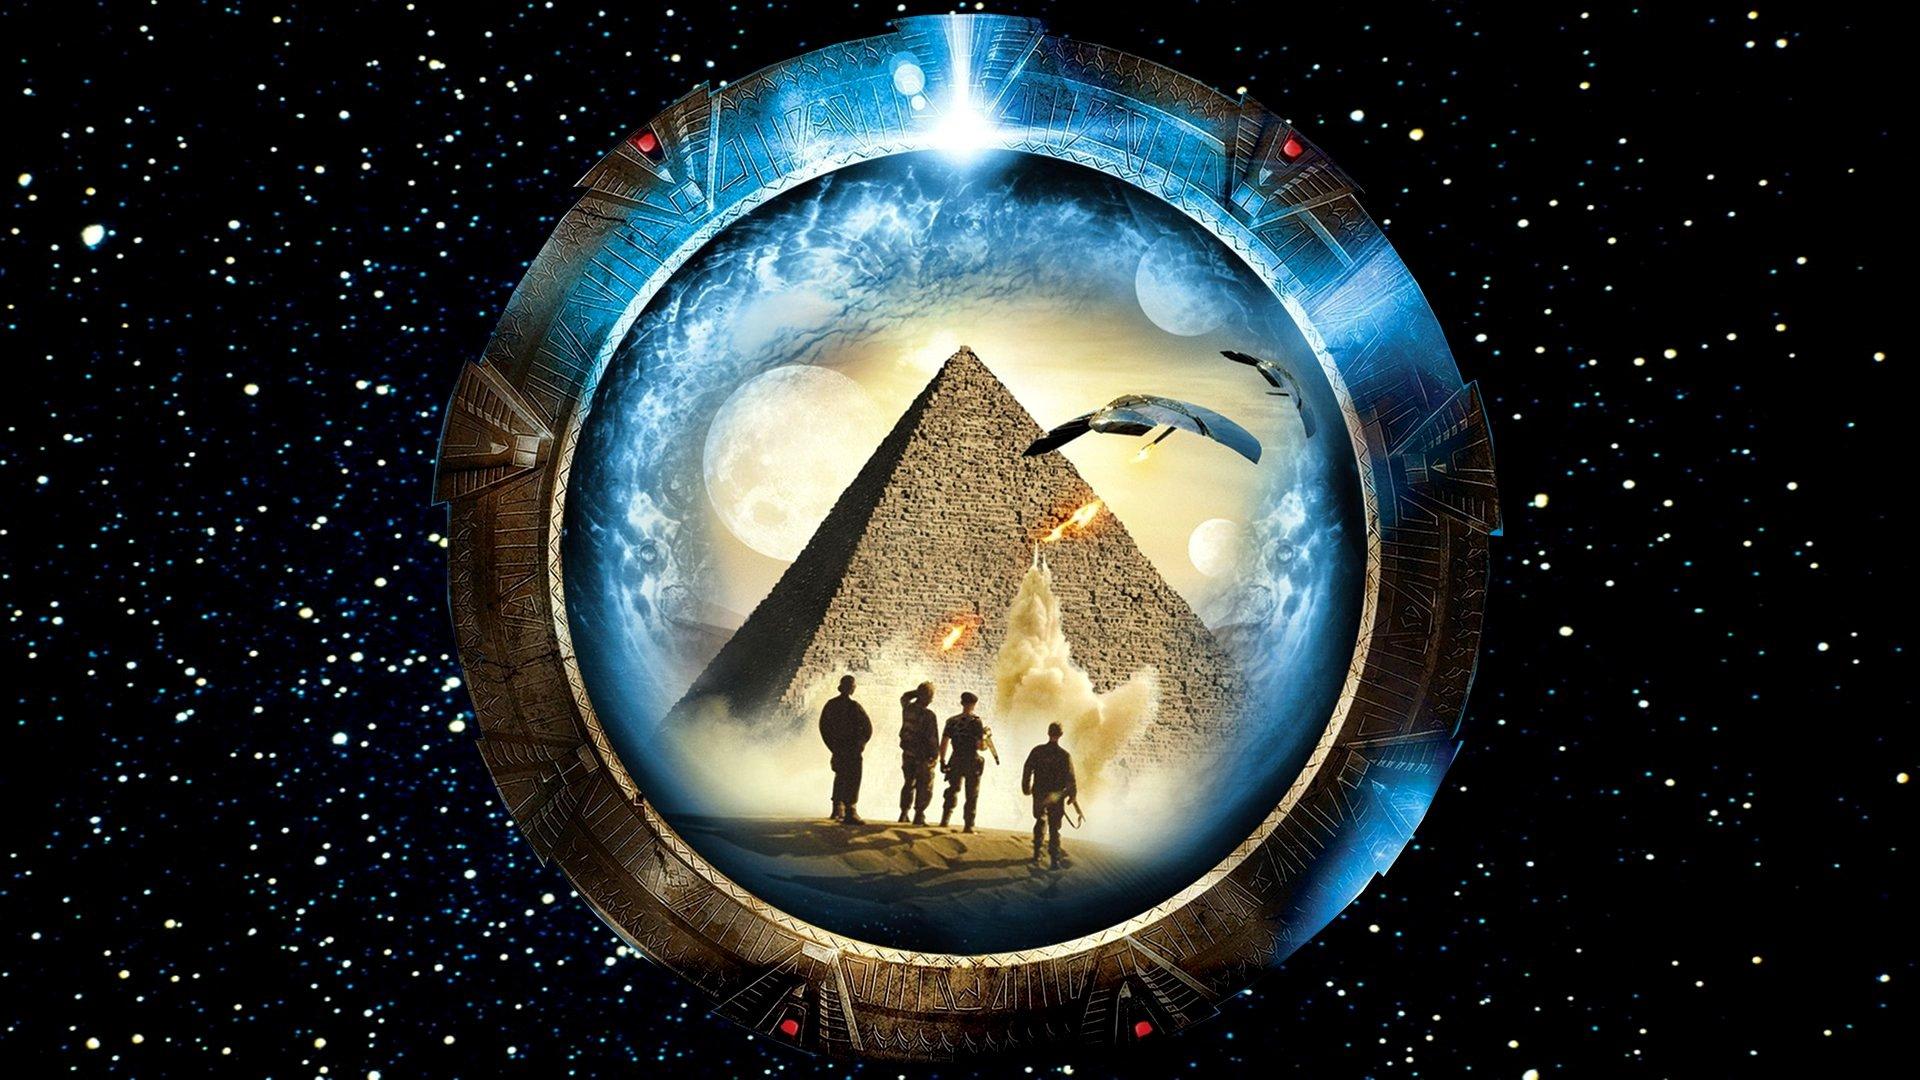 Stargate Hd Wallpaper Background Image 1920x1080 Id